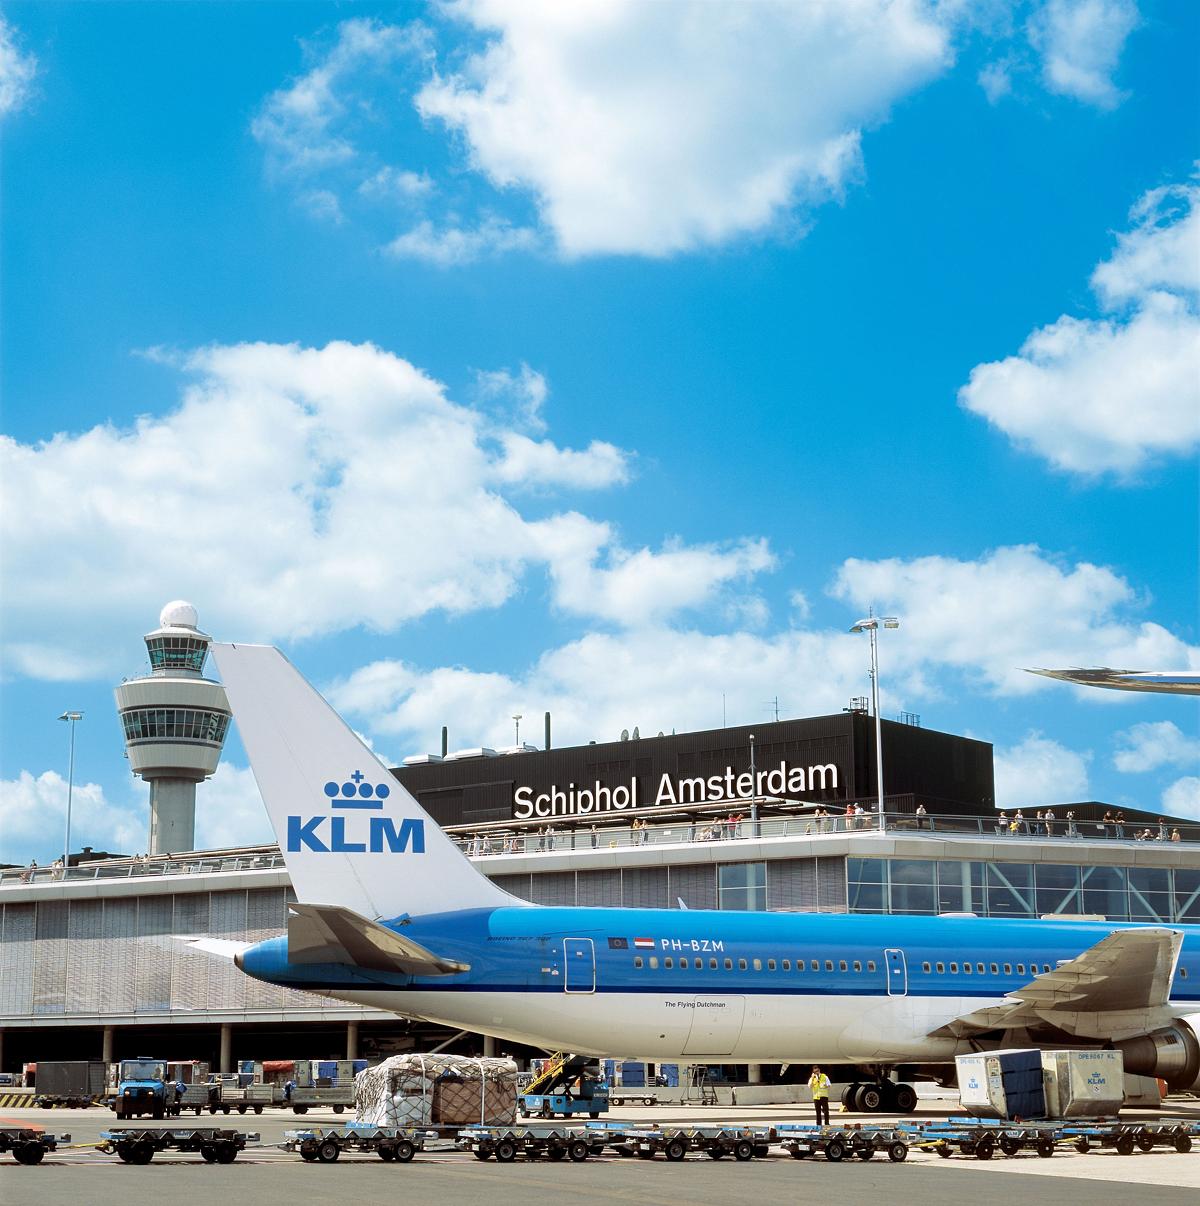 007-KLM-web.jpg